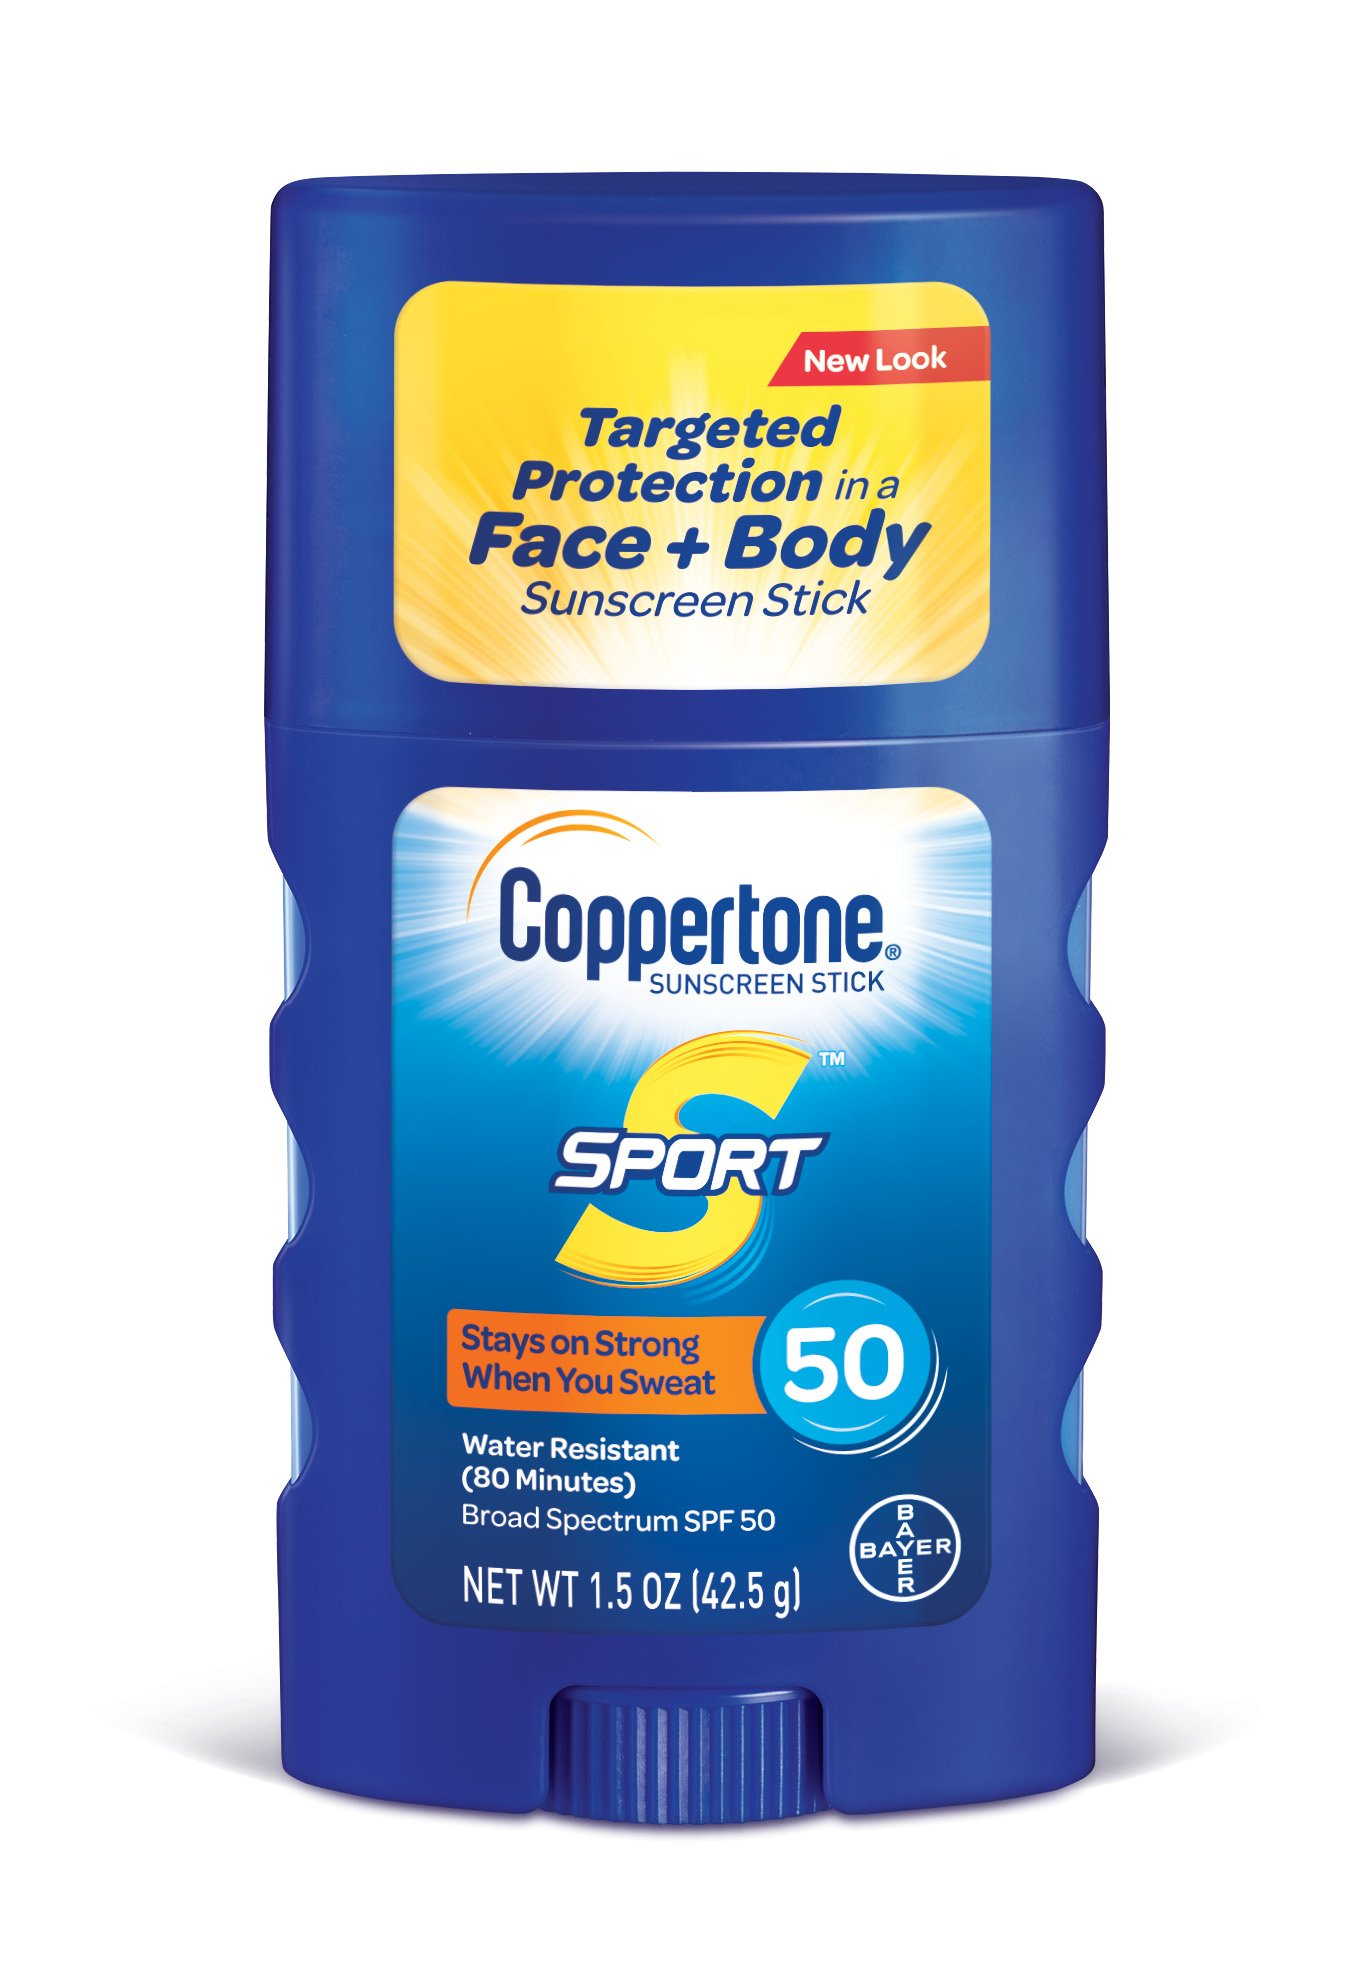 Coppertone Sport Sunscreen Stick Broad Spectrum SPF 50, 1.5 Ounces Travel Size